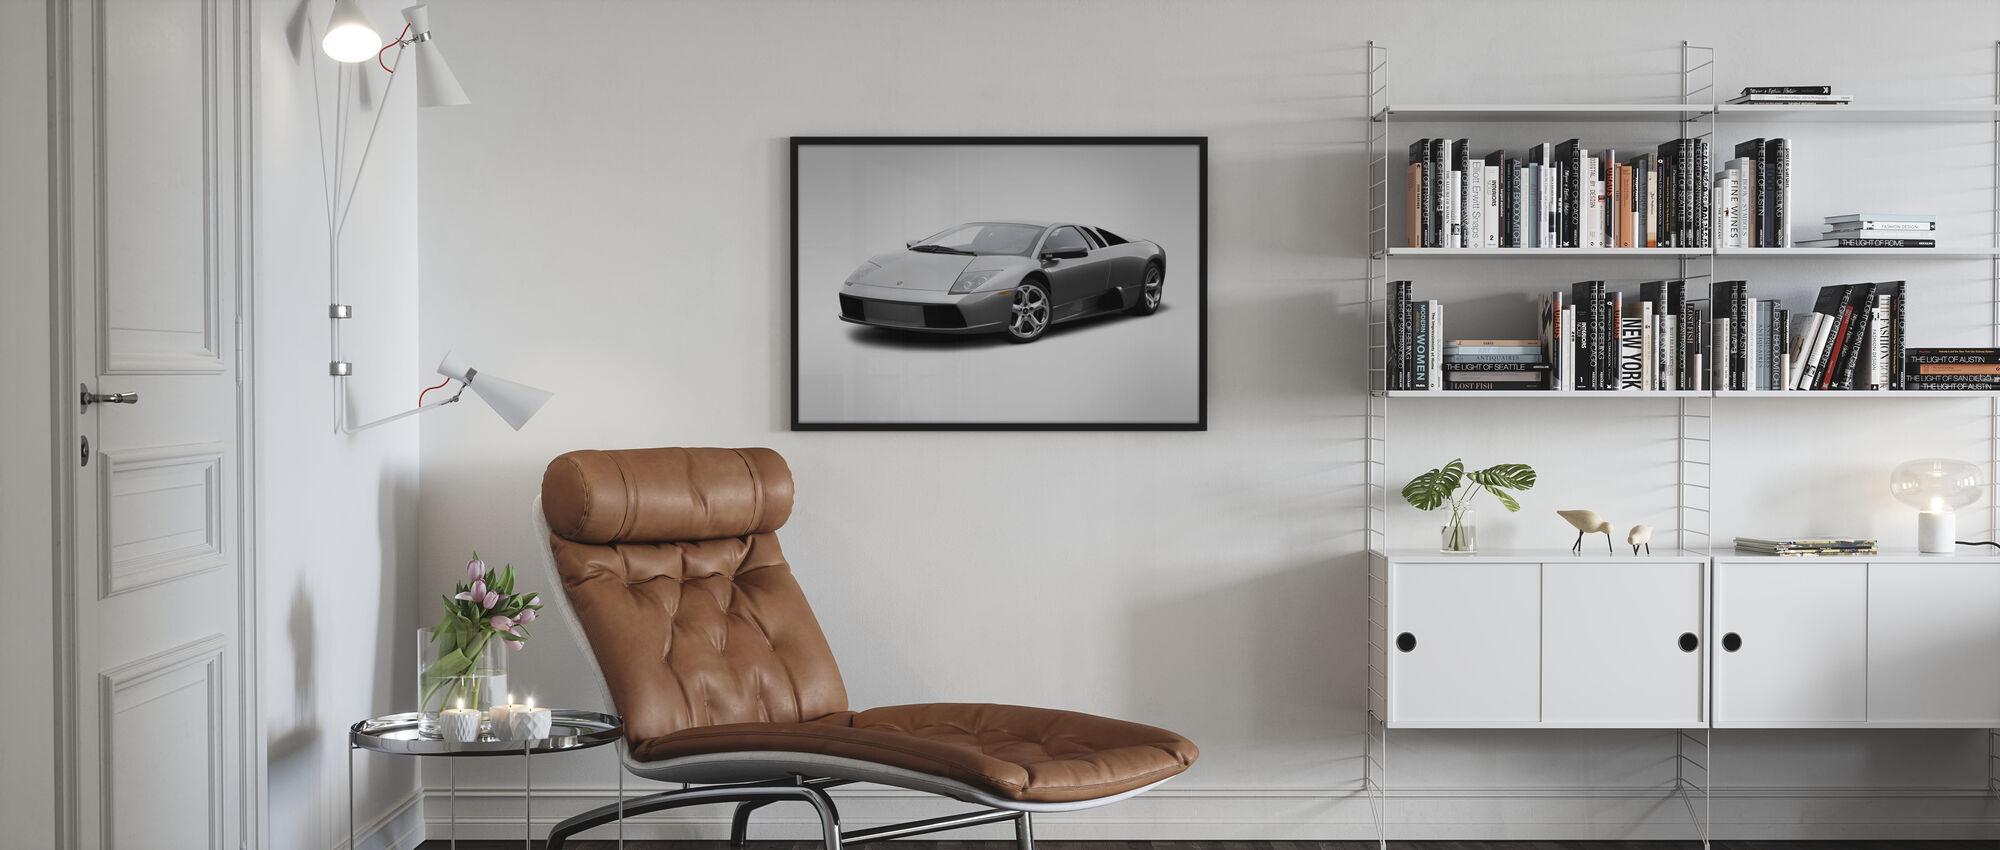 Lamborghini - Kehystetty kuva - Olohuone